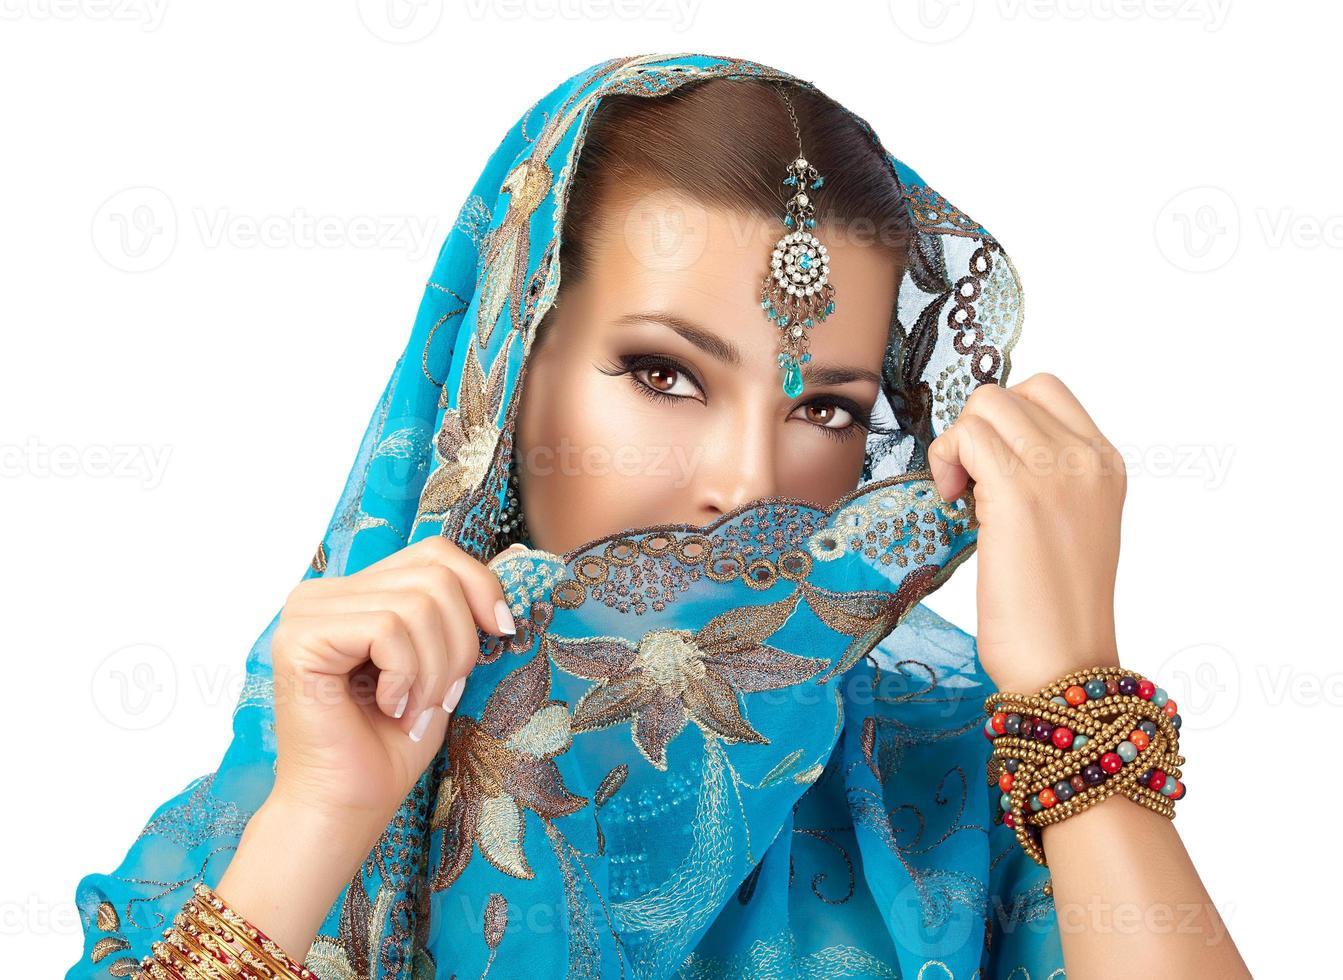 etnisk kvinna foto